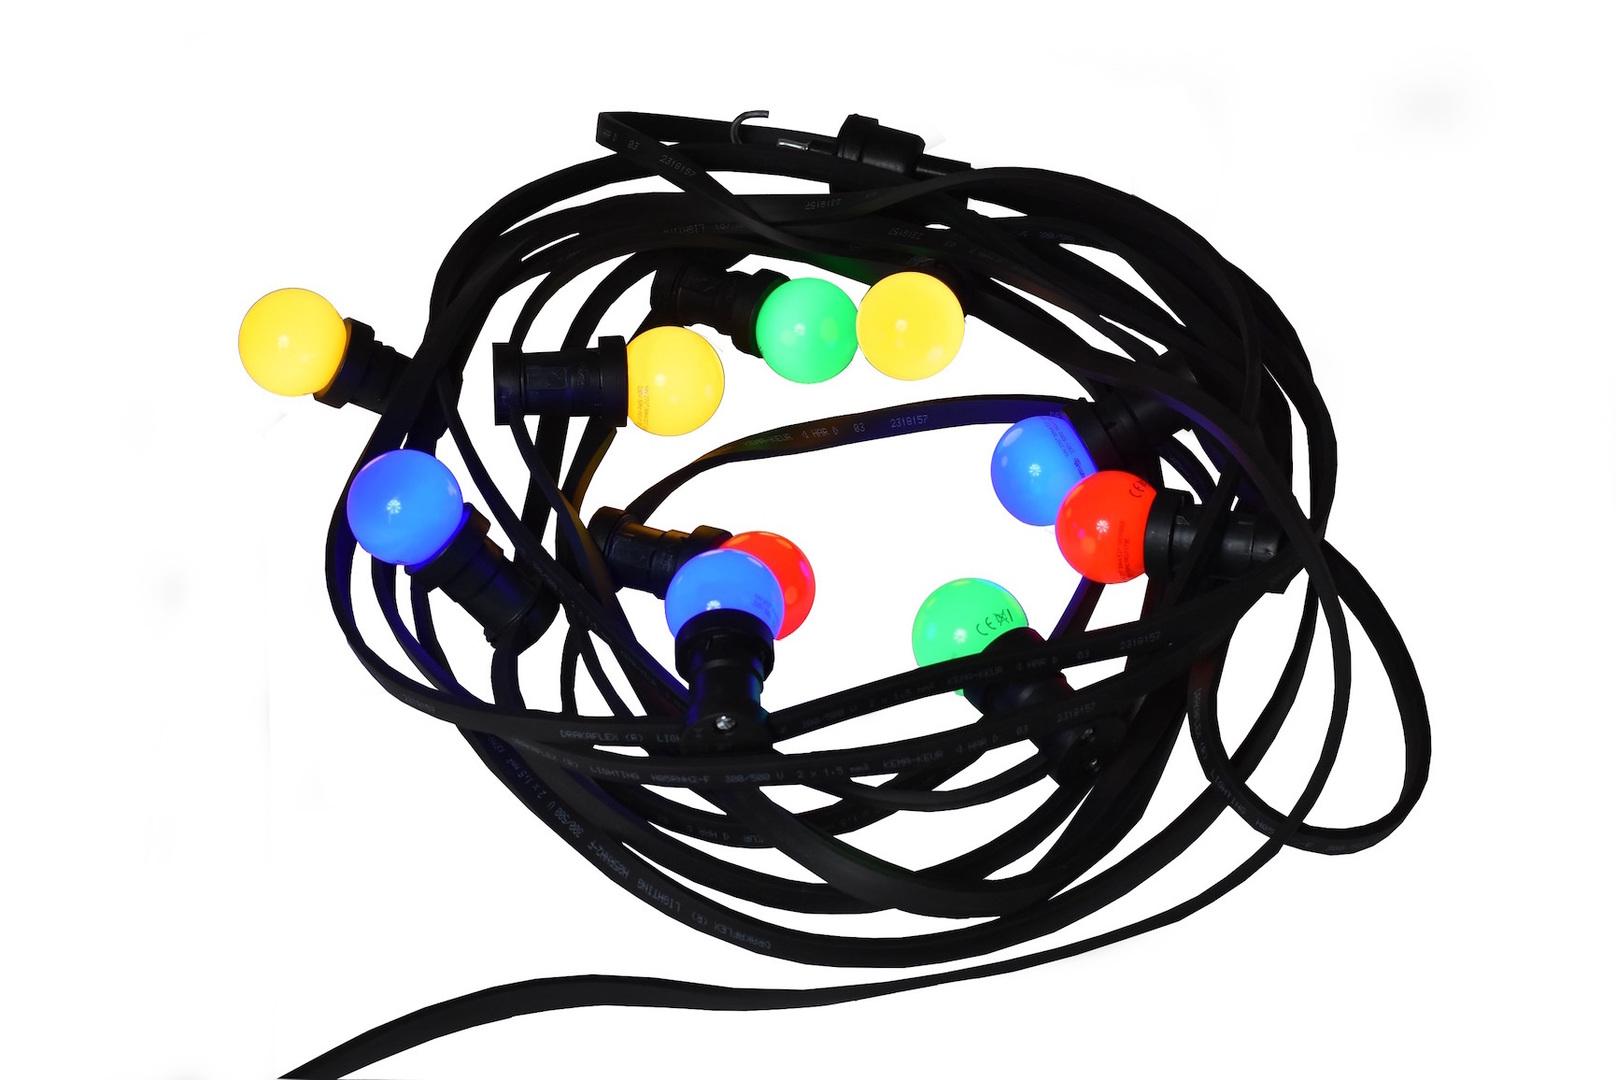 Christmas Tree Light String 30m - 60 multicolored LED bulbs